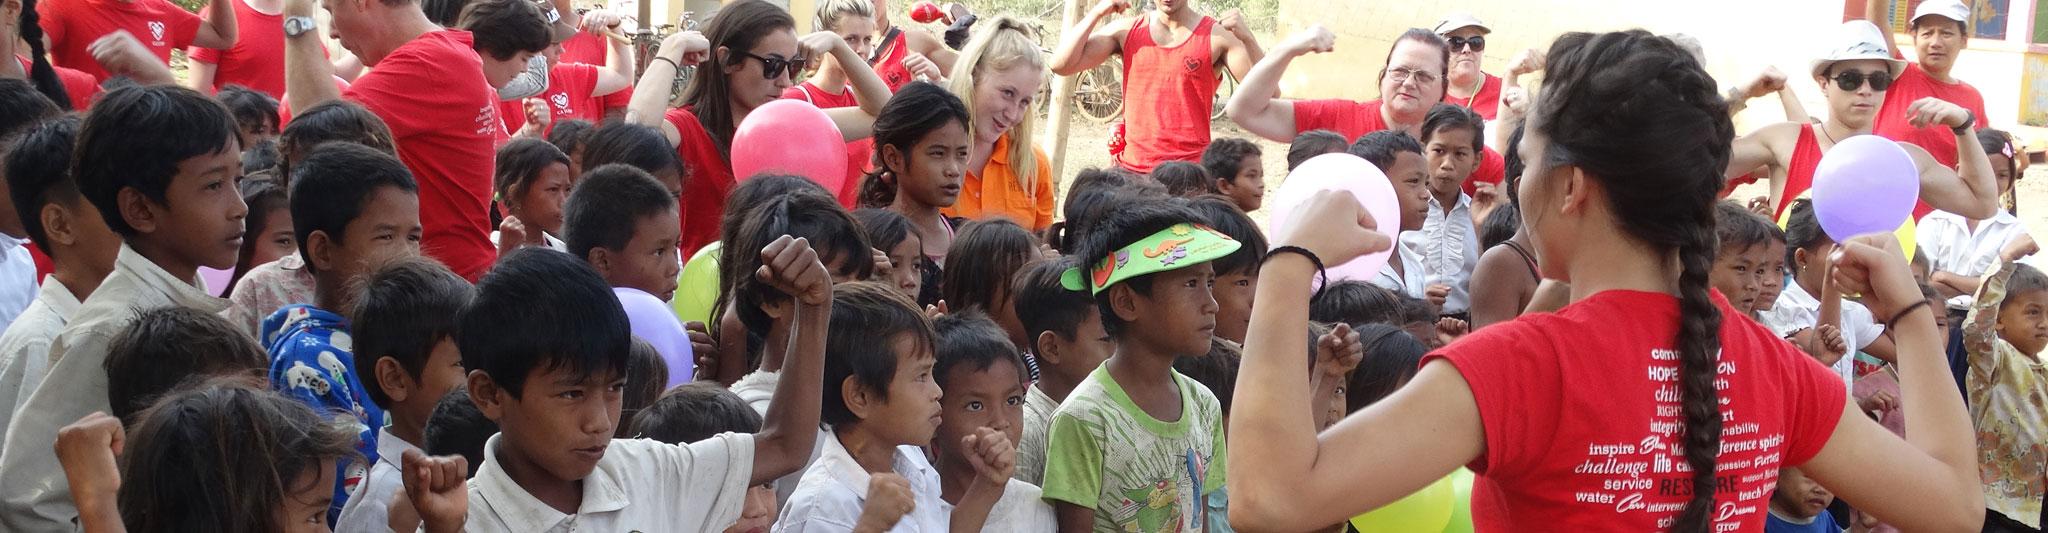 cambodia trip